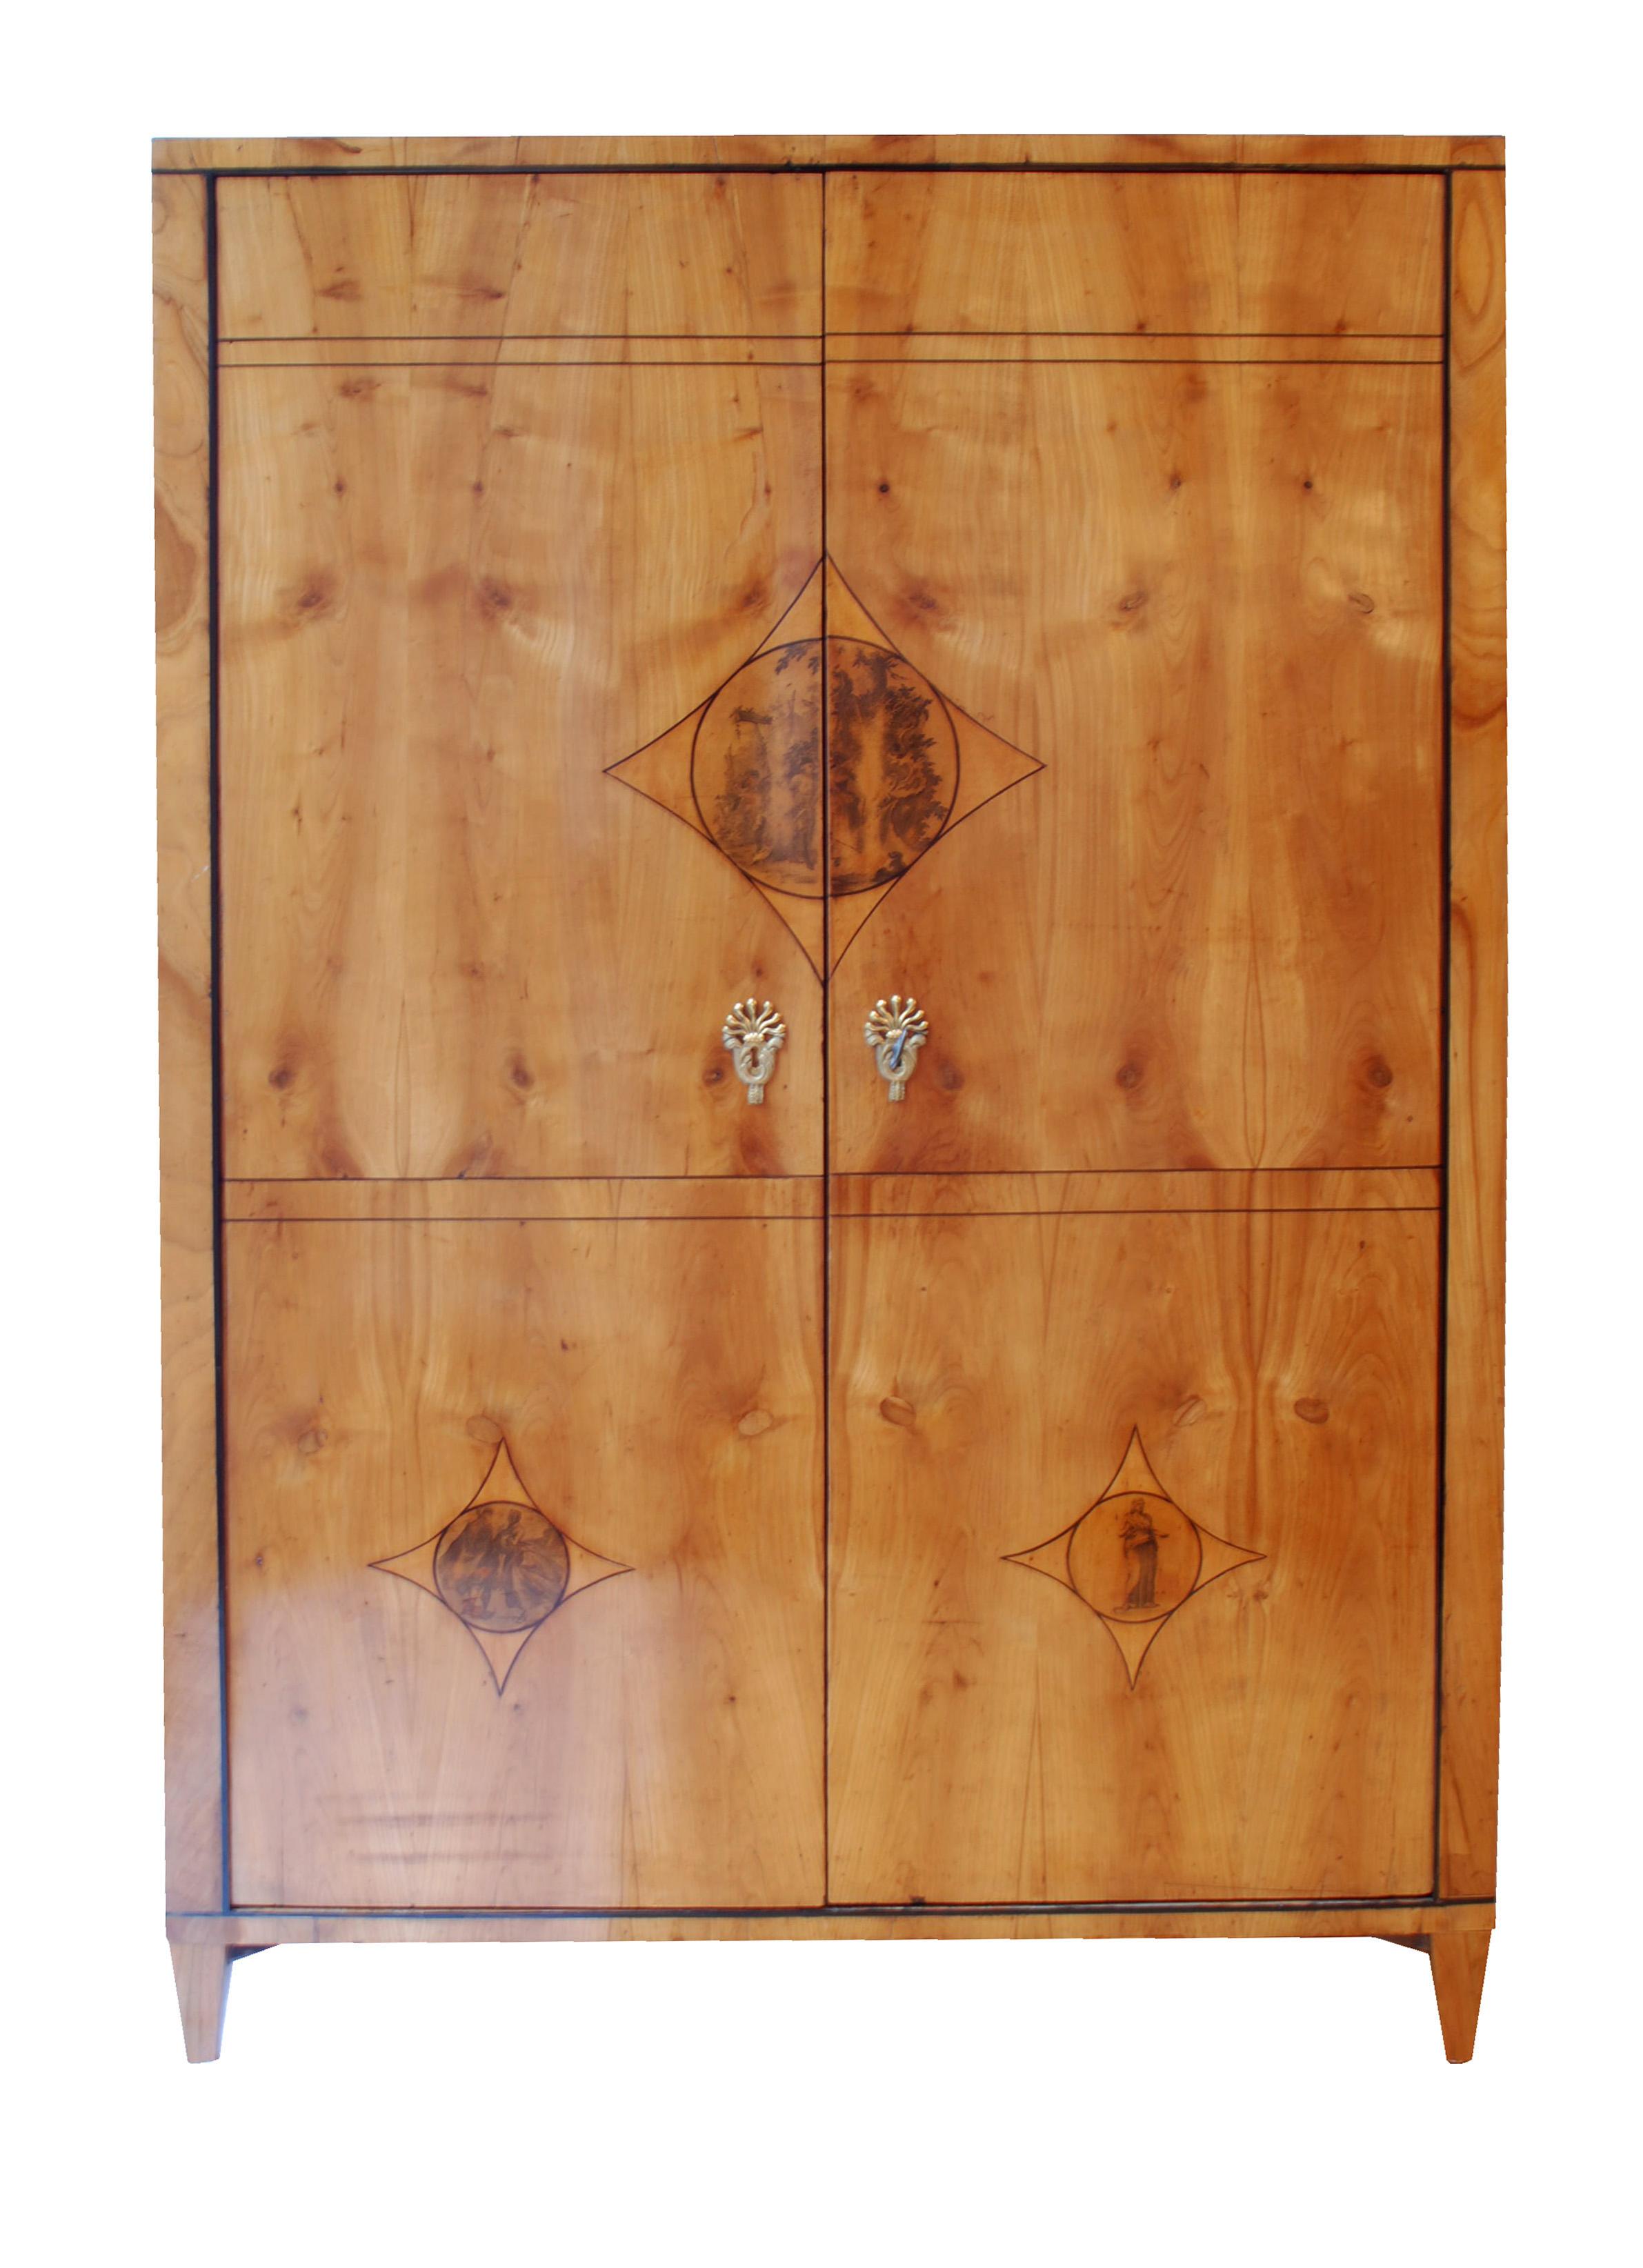 regine schmitz avila die biedermeierspezialistin in wiesbaden kirschbaumschraenke. Black Bedroom Furniture Sets. Home Design Ideas